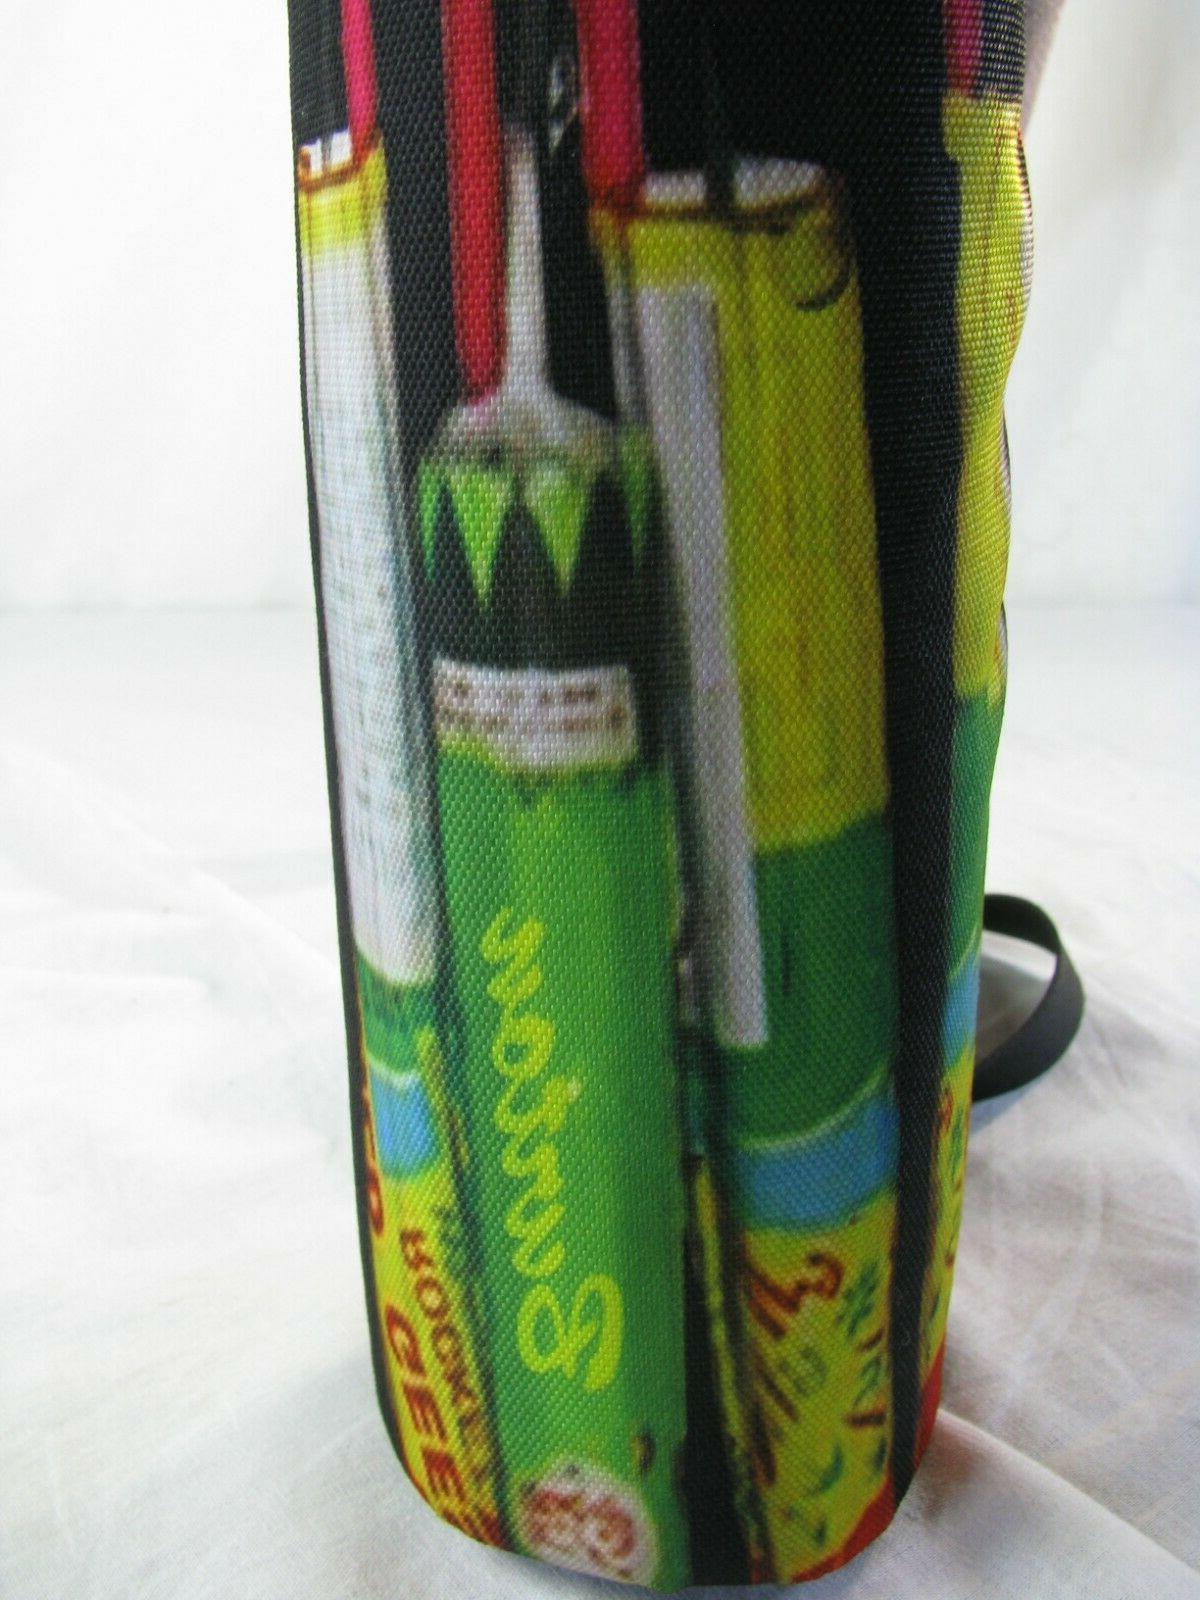 Rocket Launchers of July NWOT Burton Sling Cooler w/ Me 5